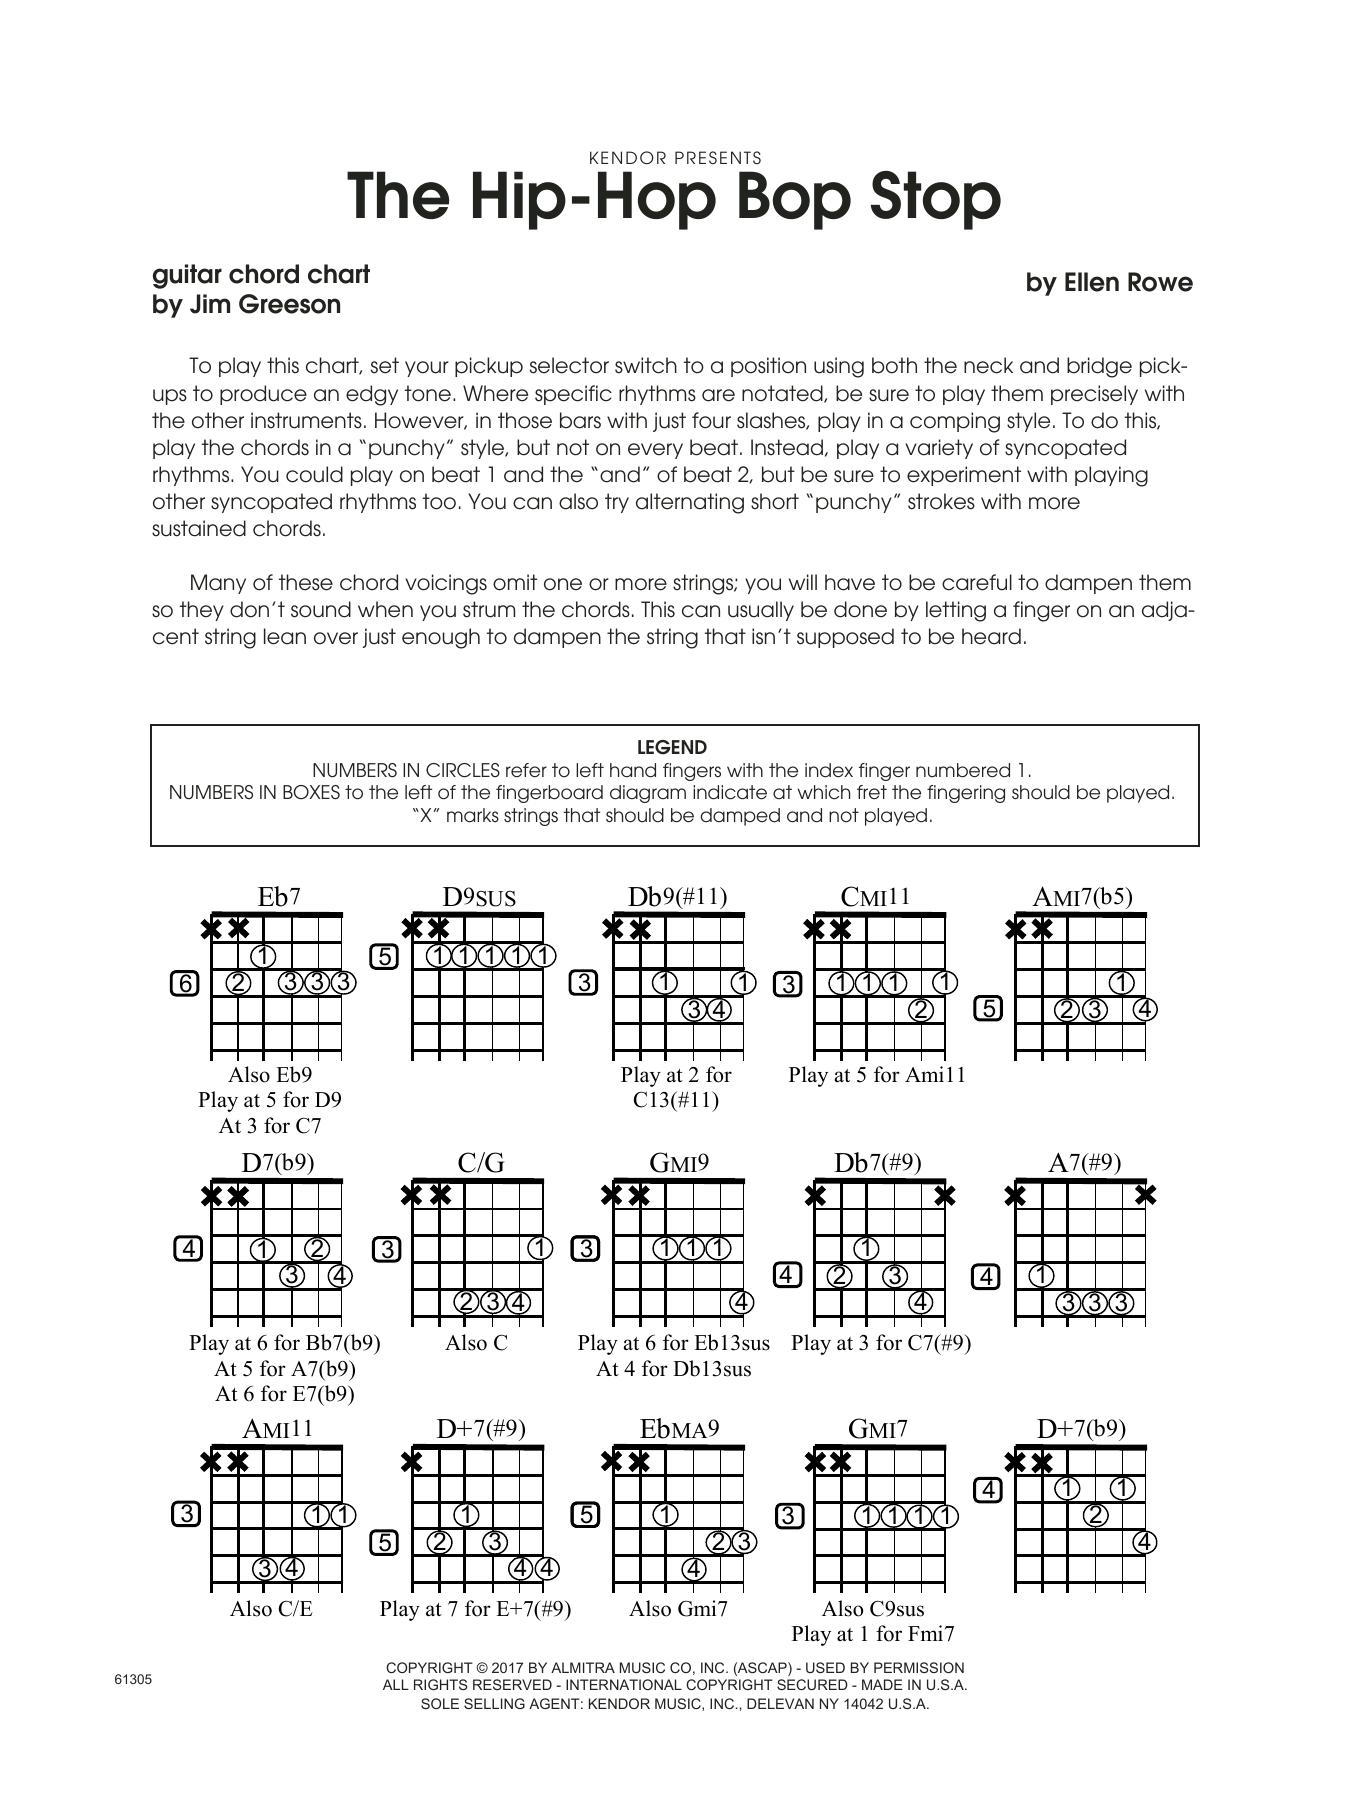 The Hip Hop Bop Stop Guitar Chord Chart At Stantons Sheet Music